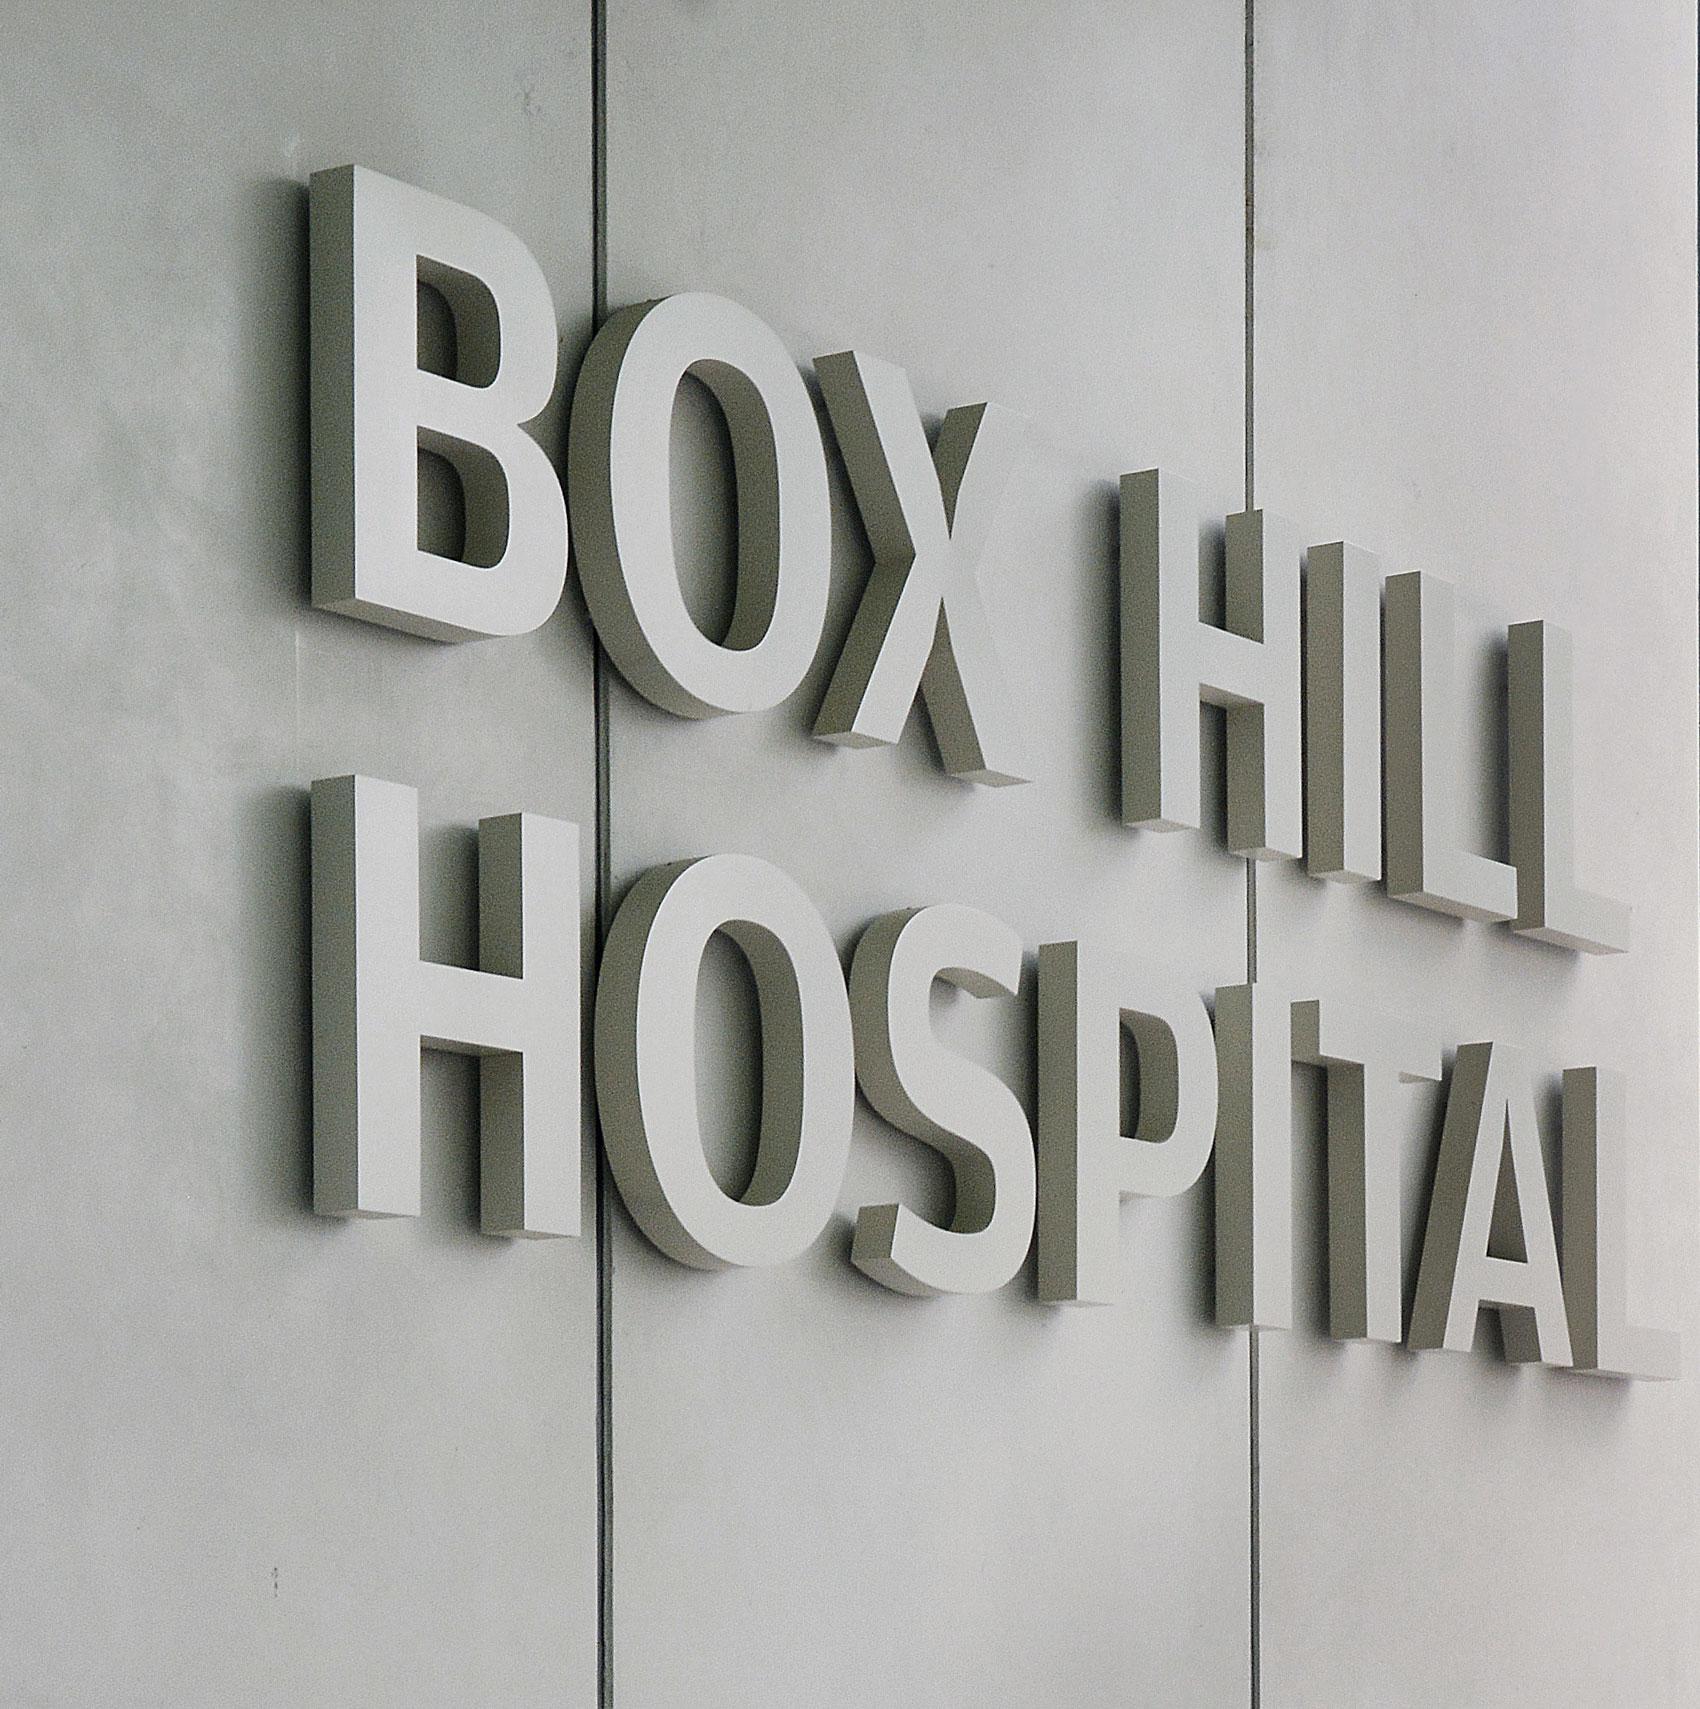 idlab_boxhill_101.jpg